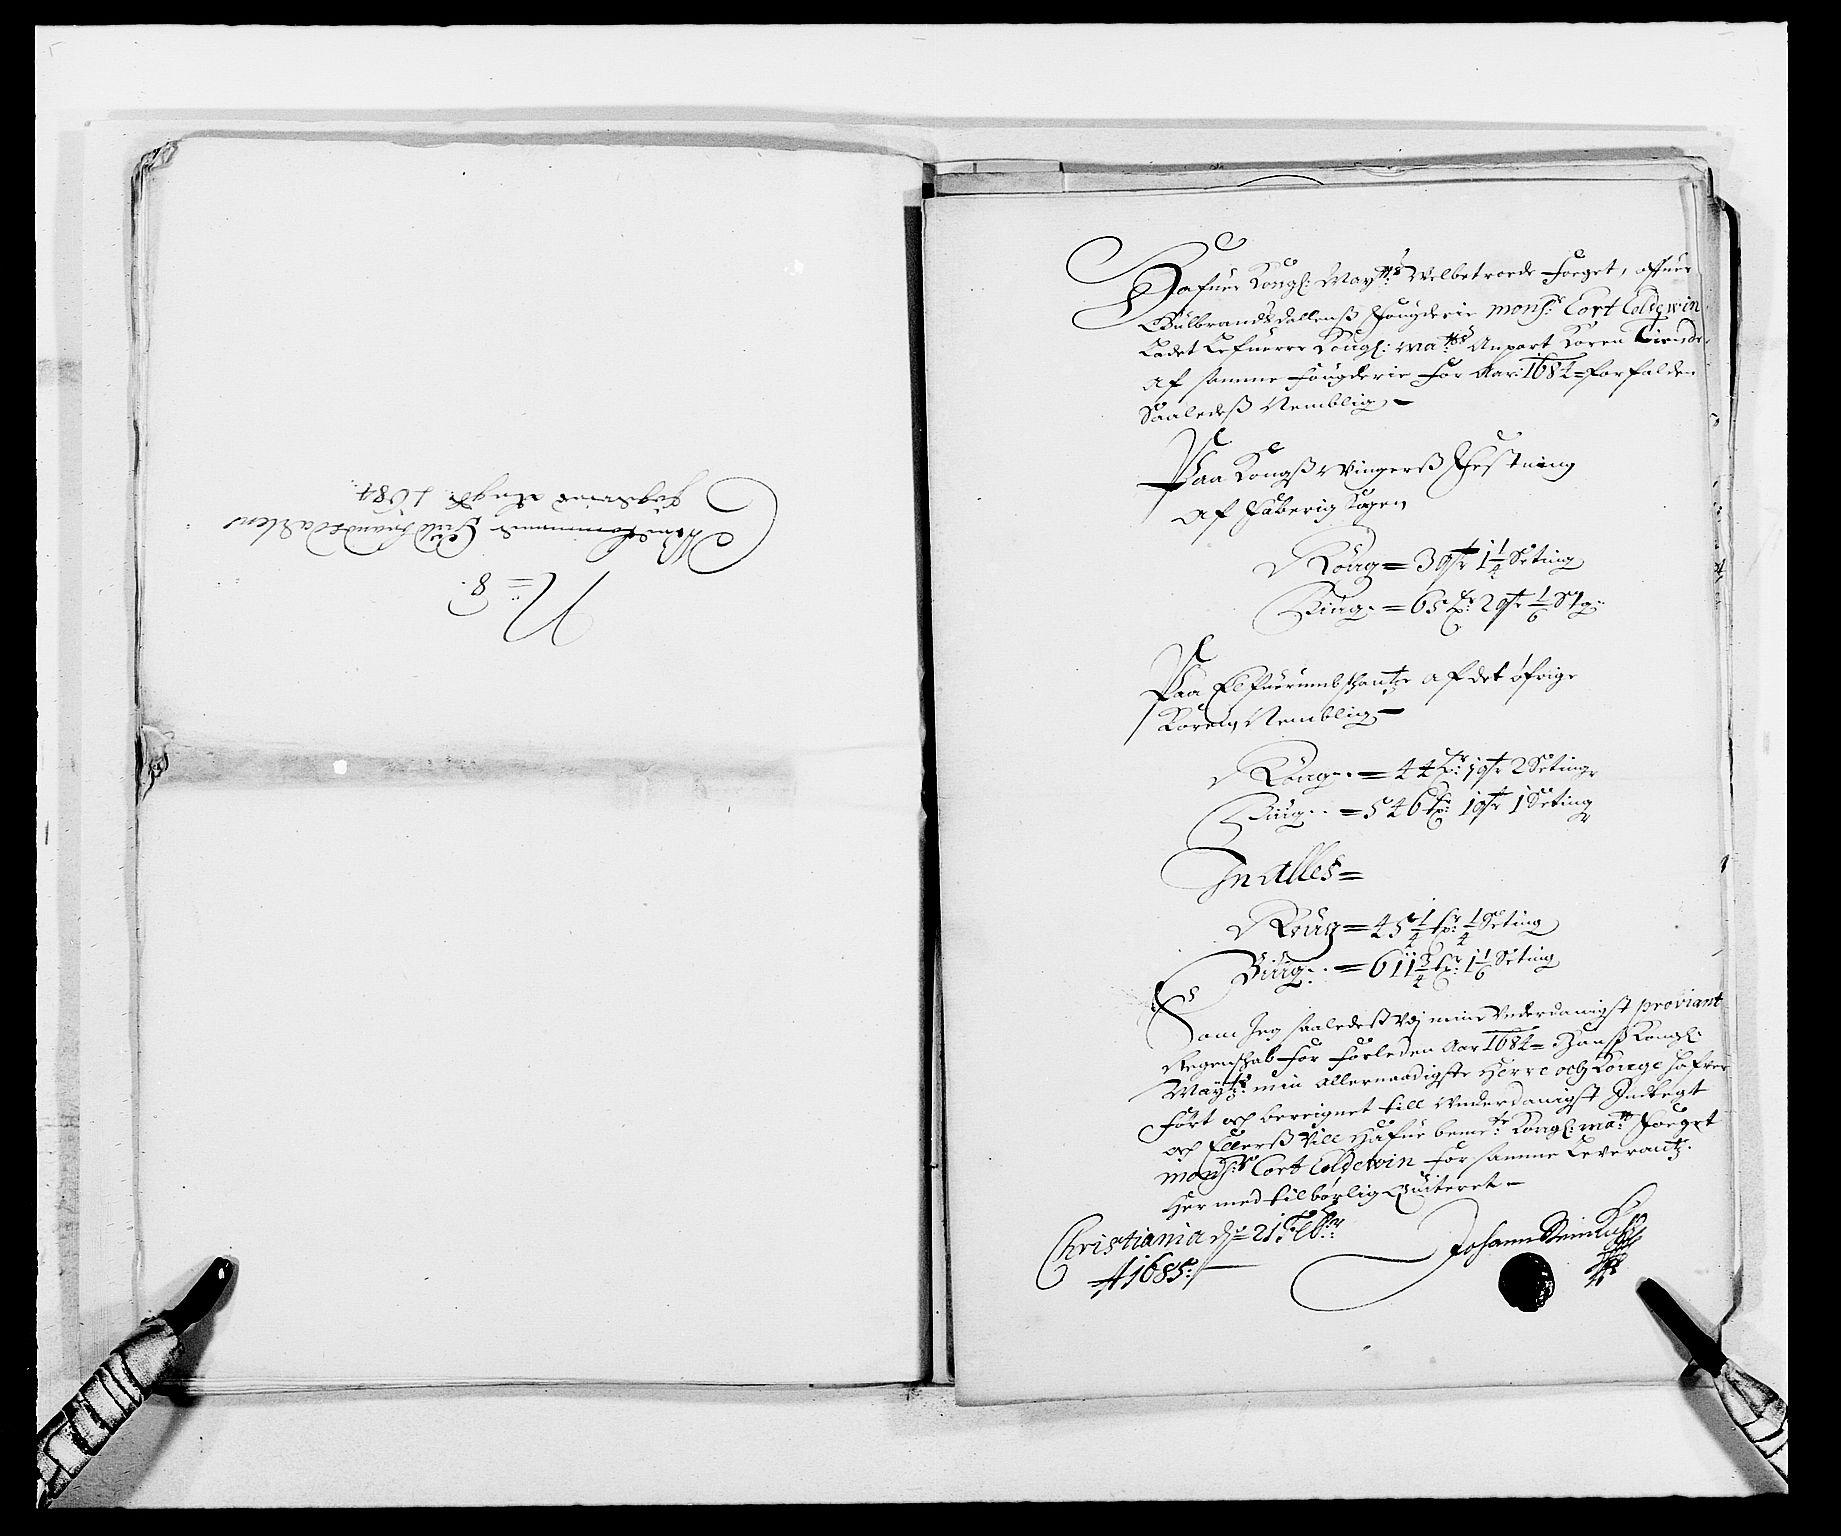 RA, Rentekammeret inntil 1814, Reviderte regnskaper, Fogderegnskap, R17/L1159: Fogderegnskap Gudbrandsdal, 1682-1689, s. 326